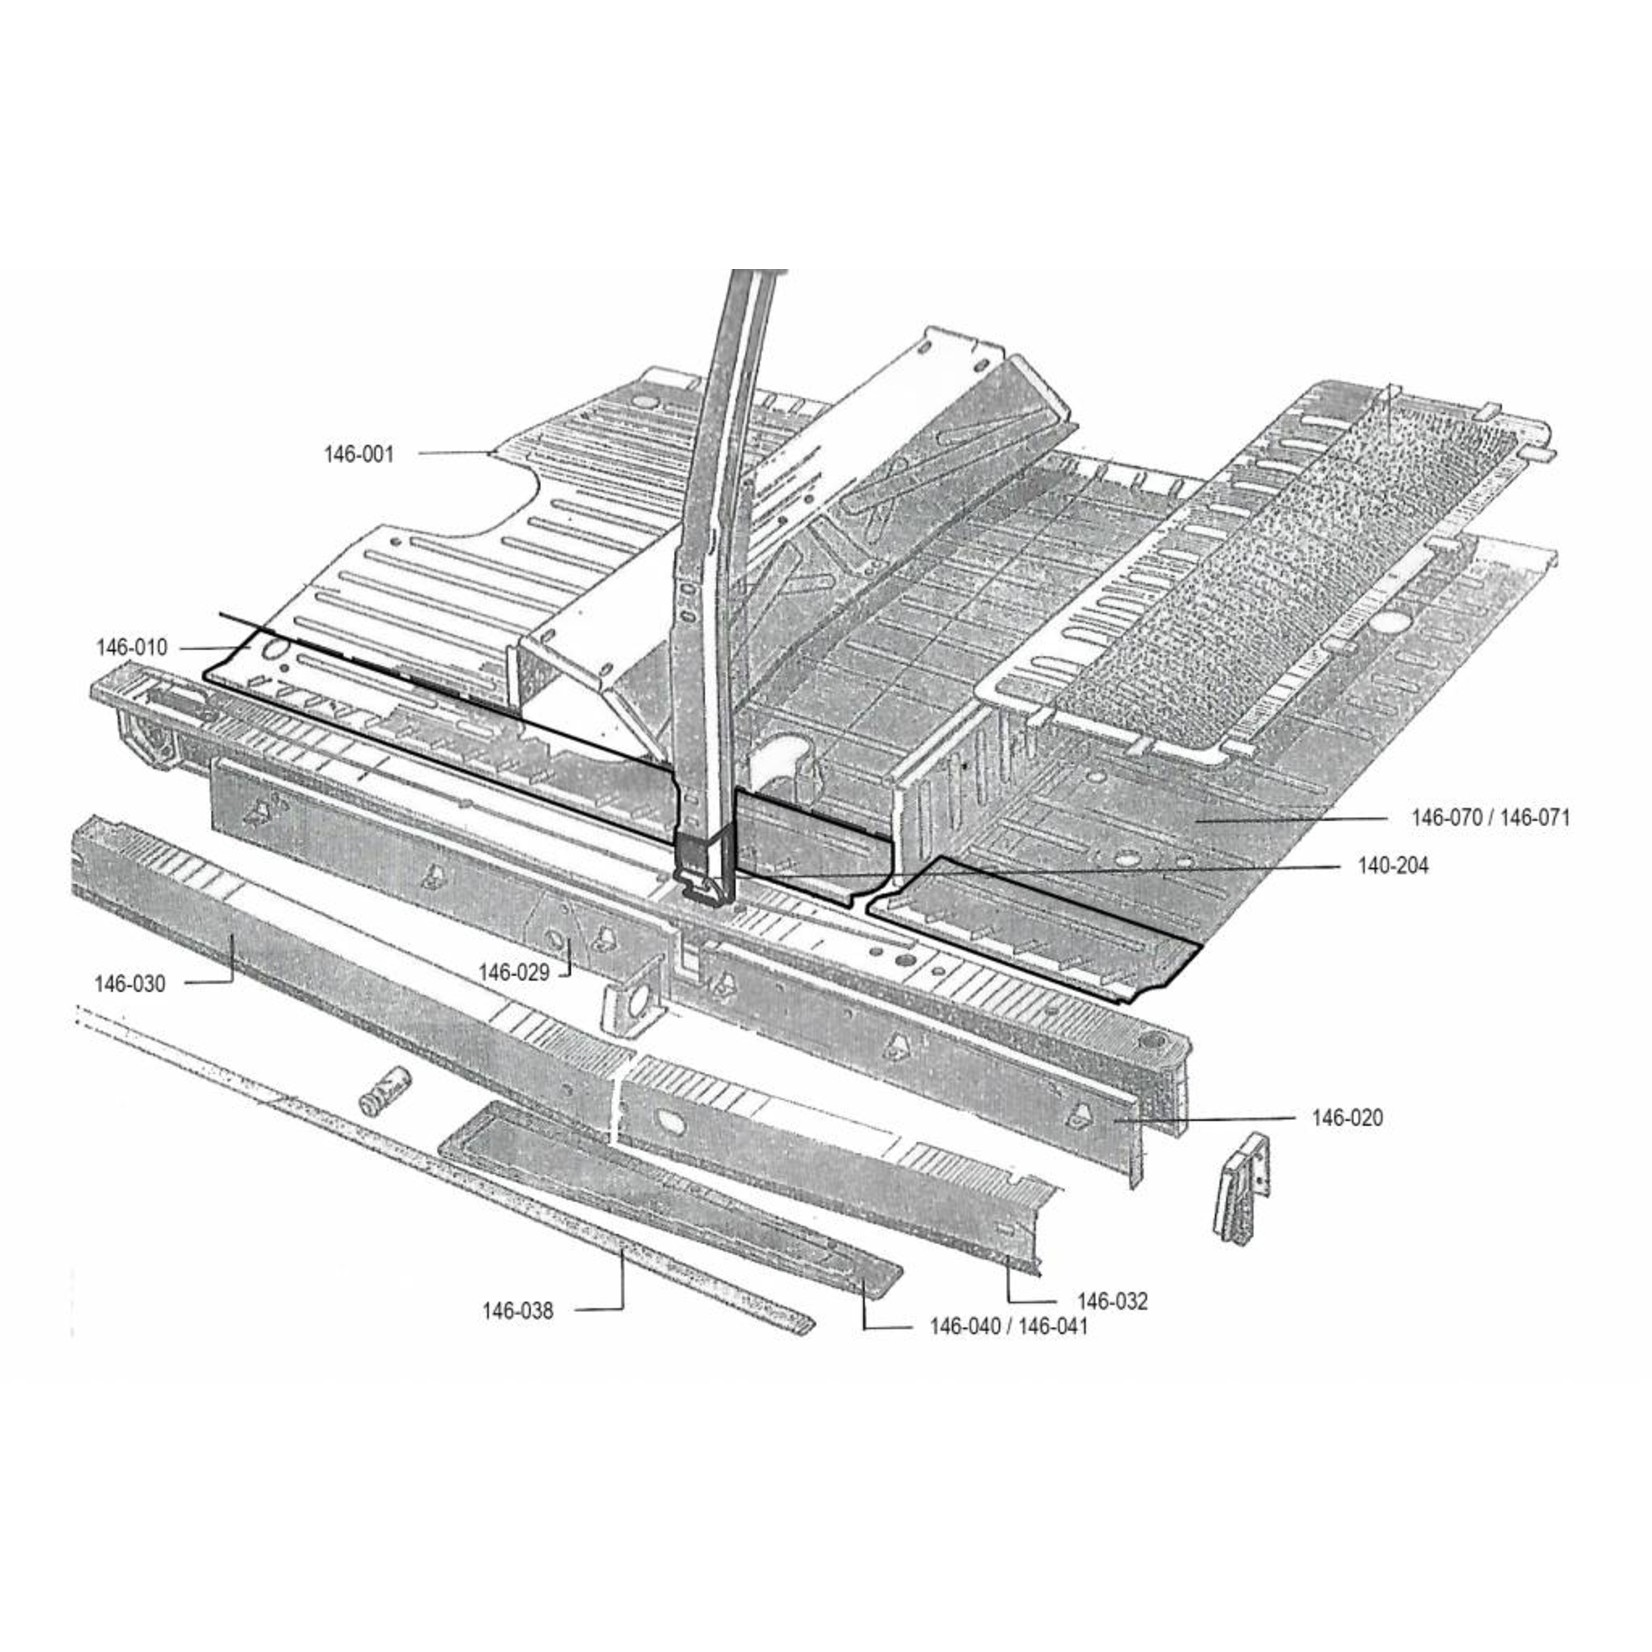 Plancha sous deposito d'original Nr Org: DX7443